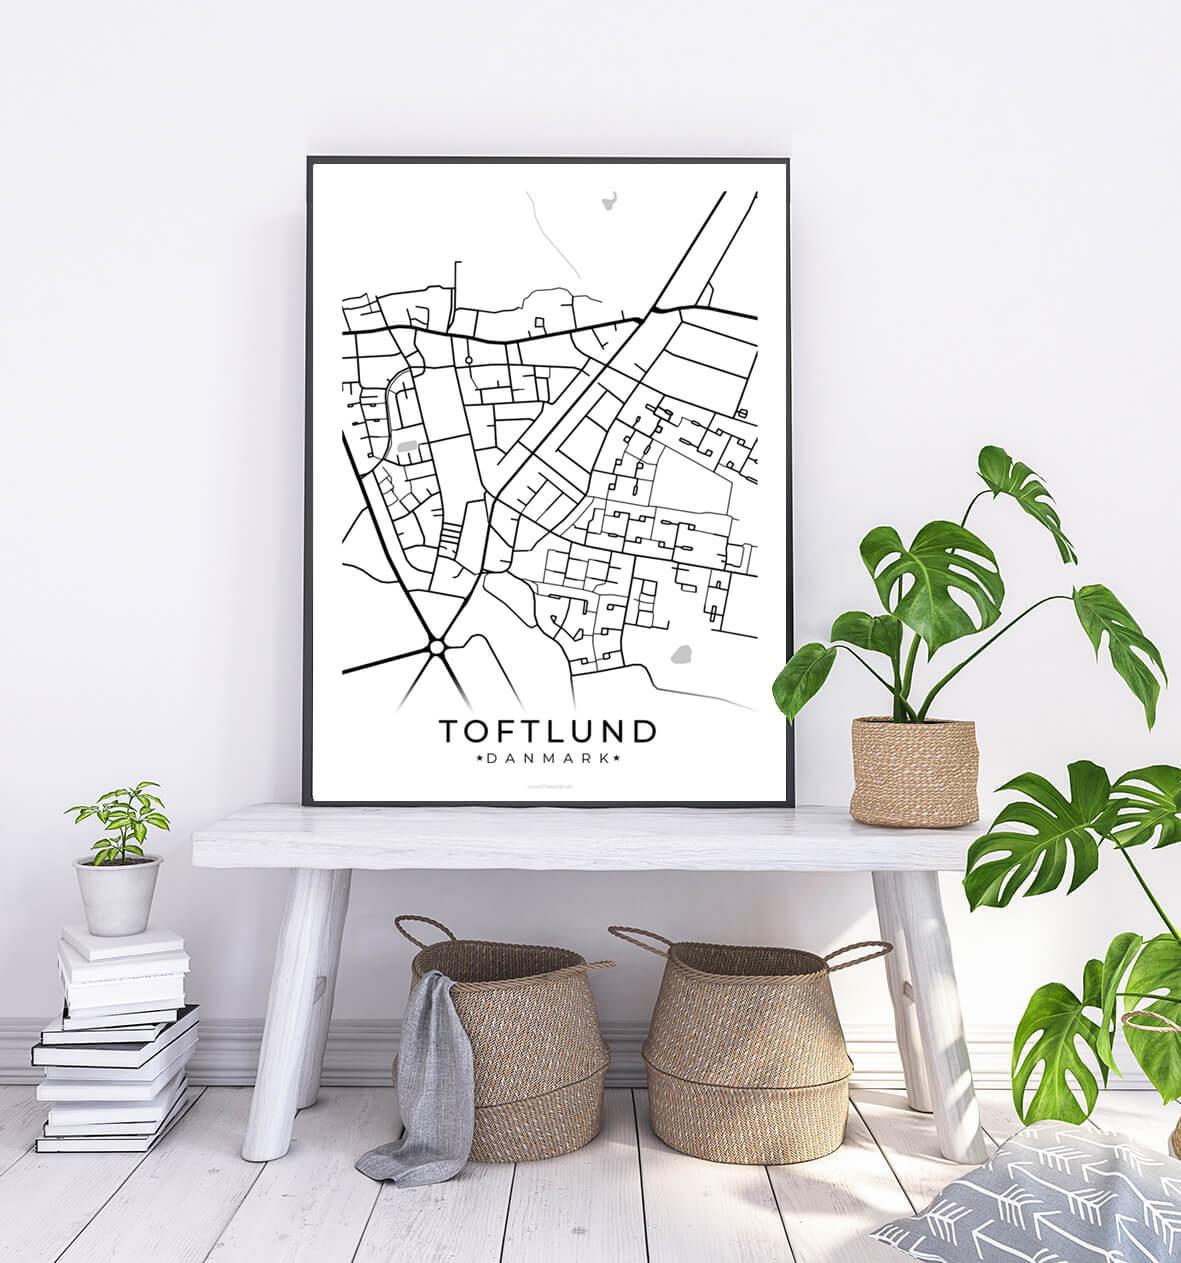 Toftlund-plakat-hvid-3